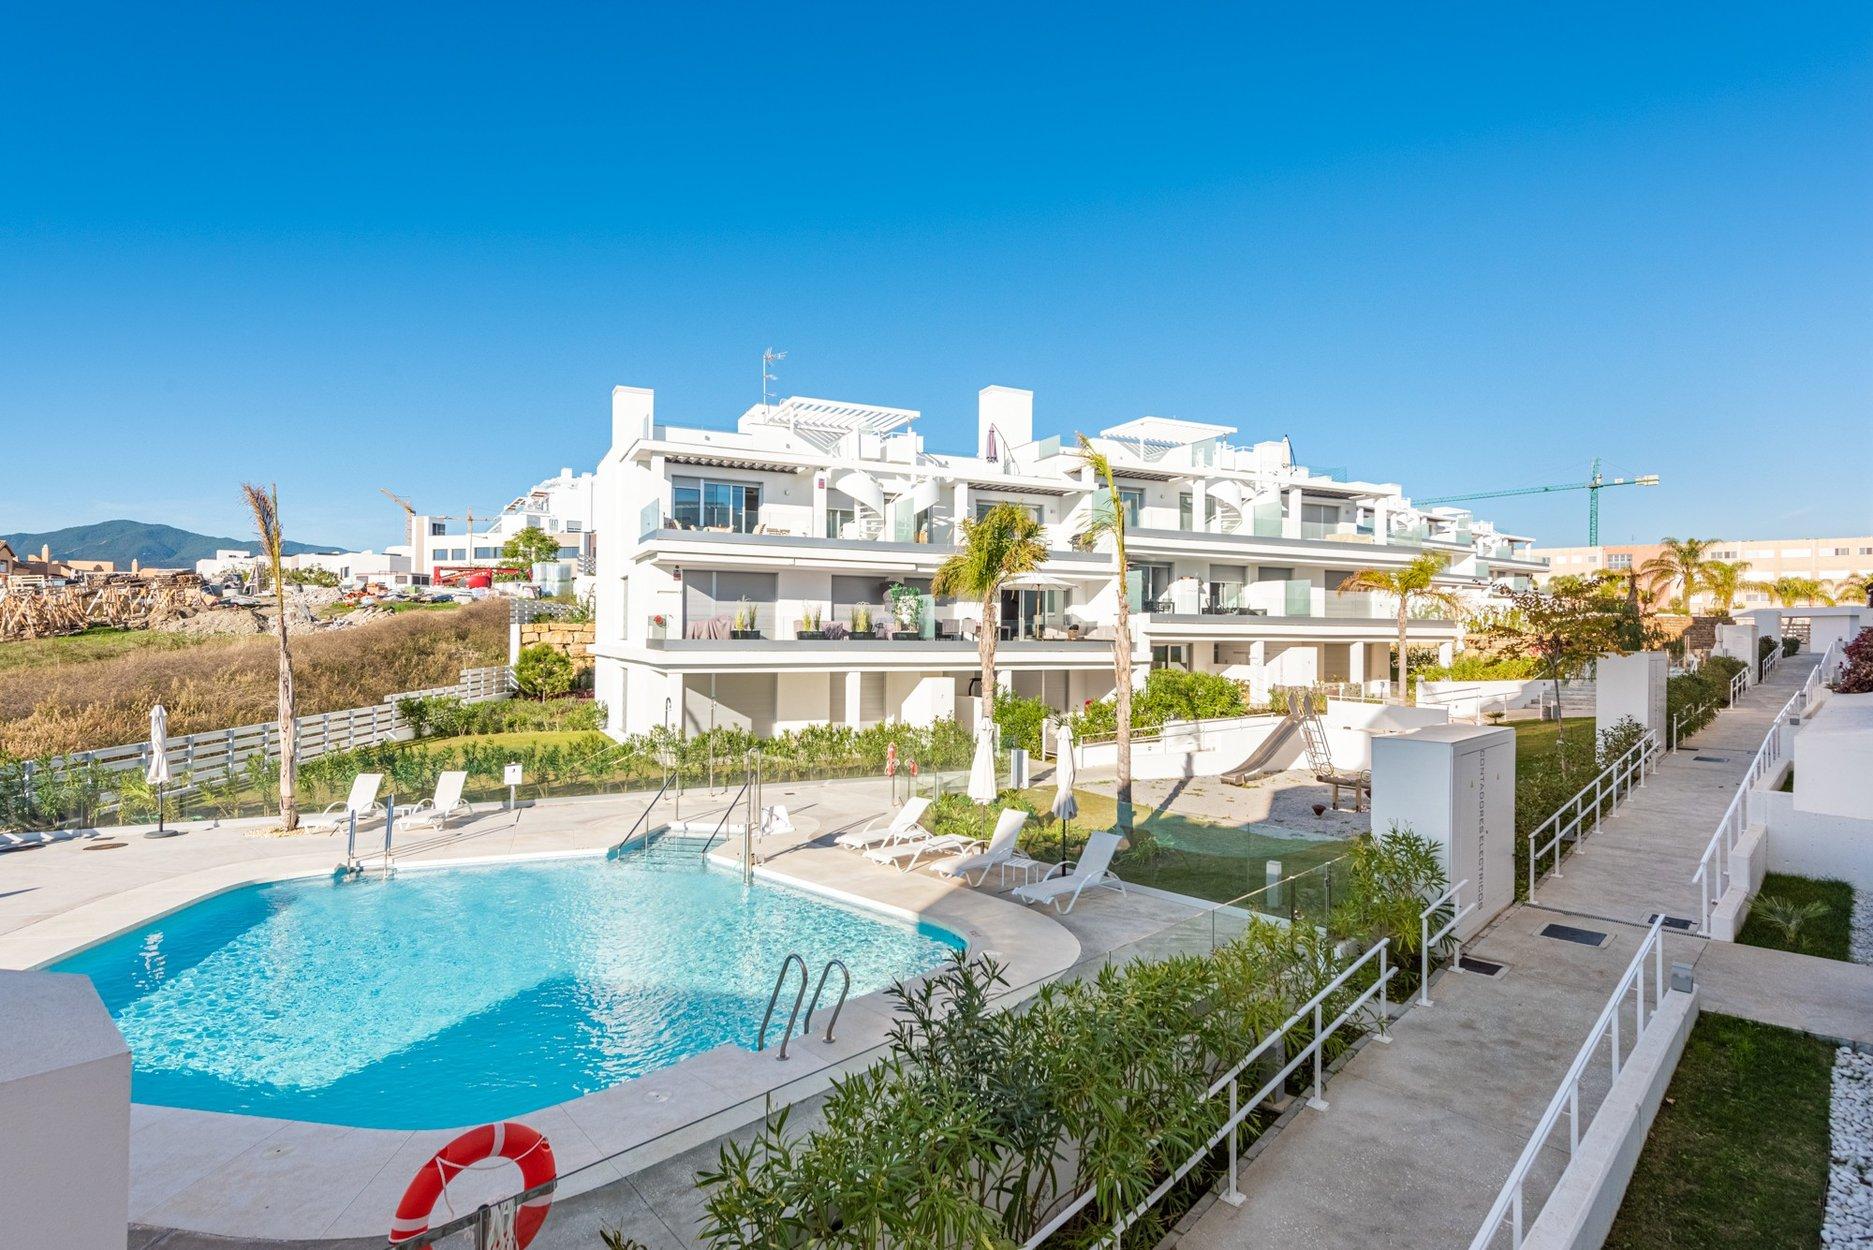 Apartment for sale in Estepona, Le Mirage